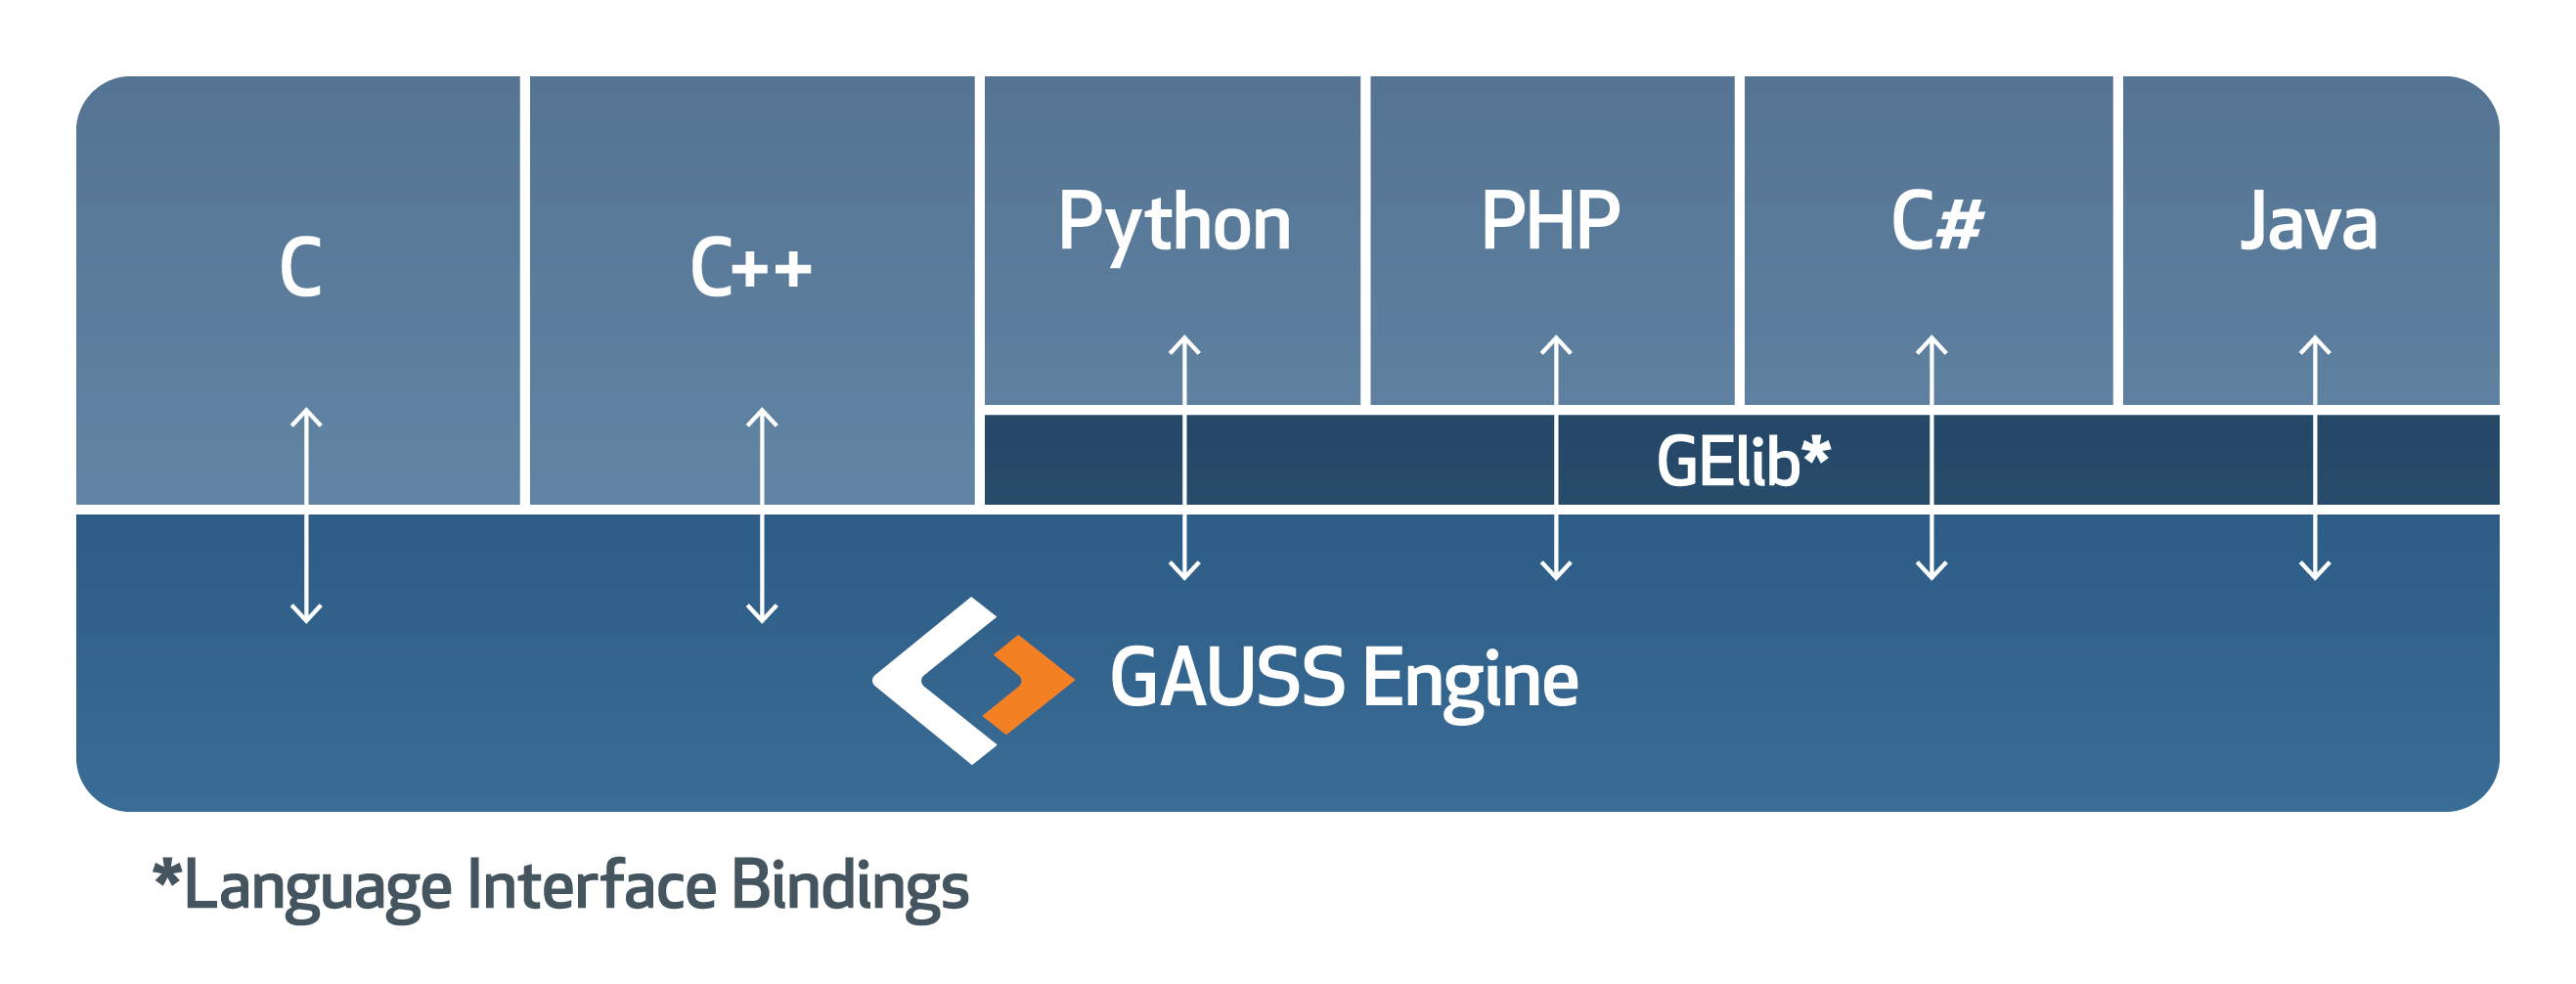 Explore GAUSS Engine | Aptech